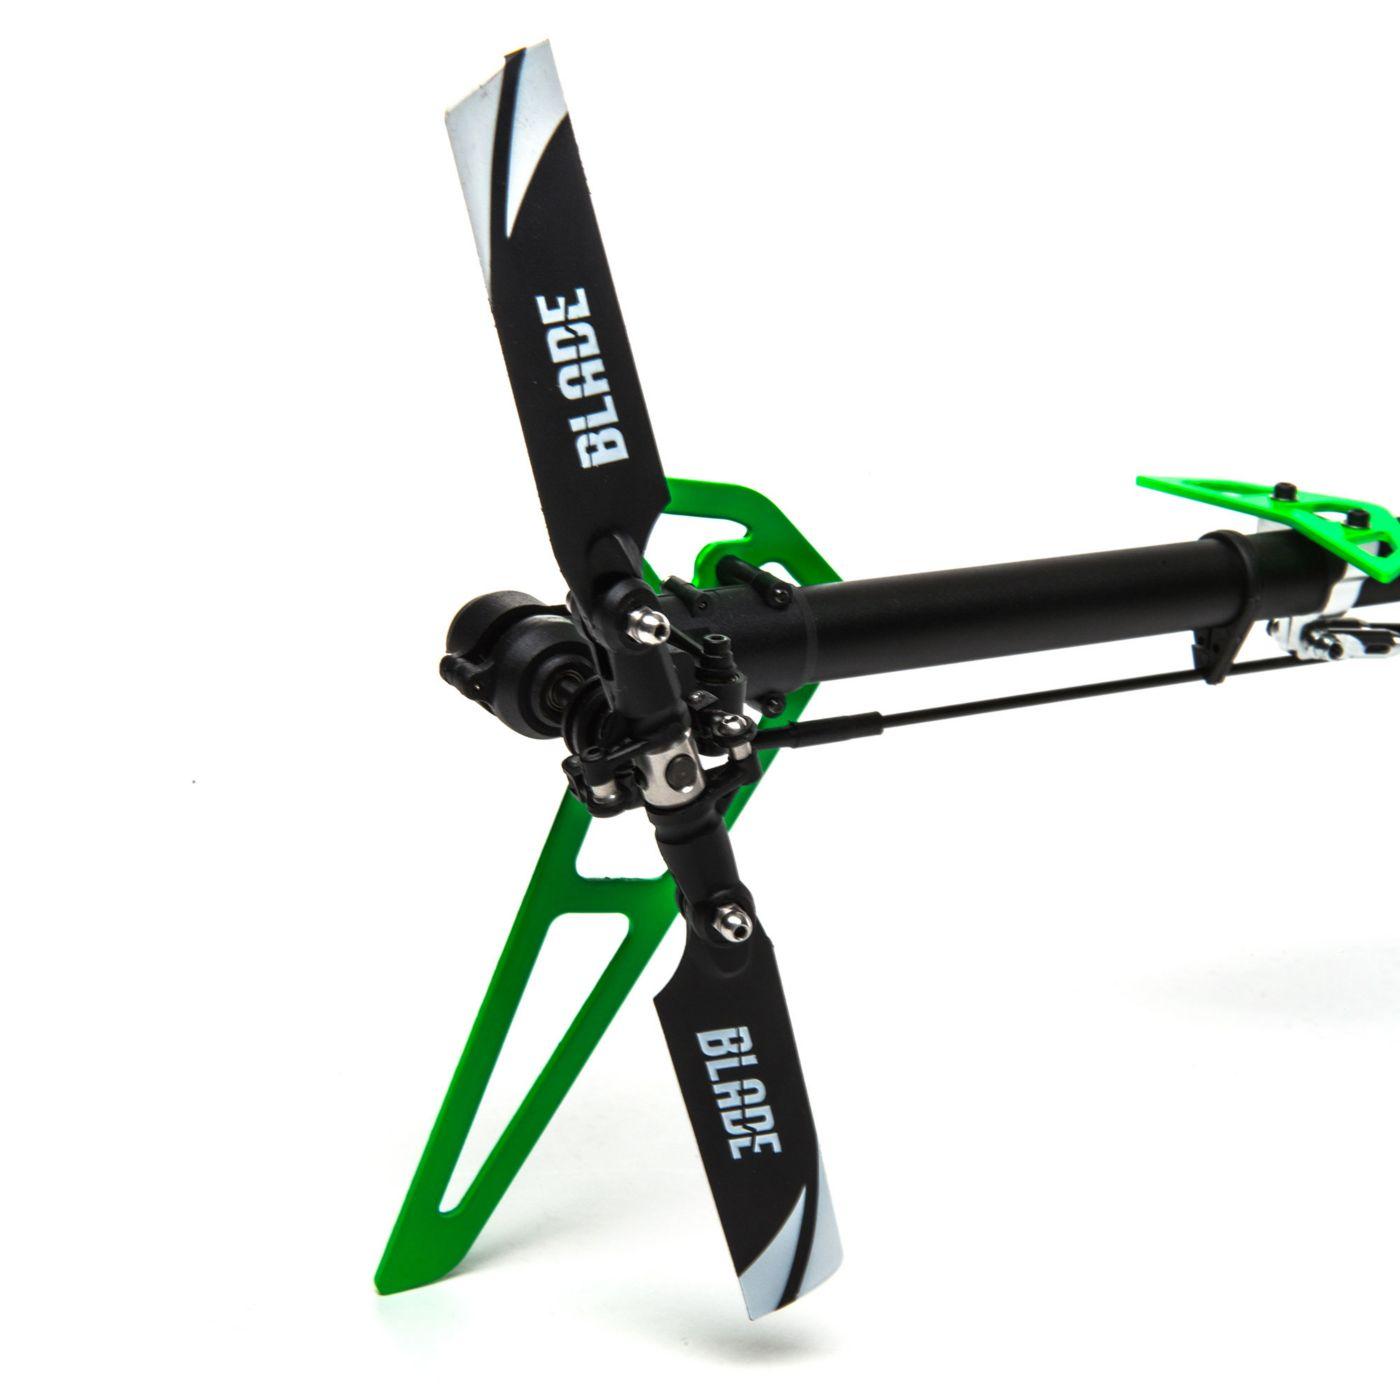 Blade 360 CFX 3S Elicottero rc bnf 3d 06